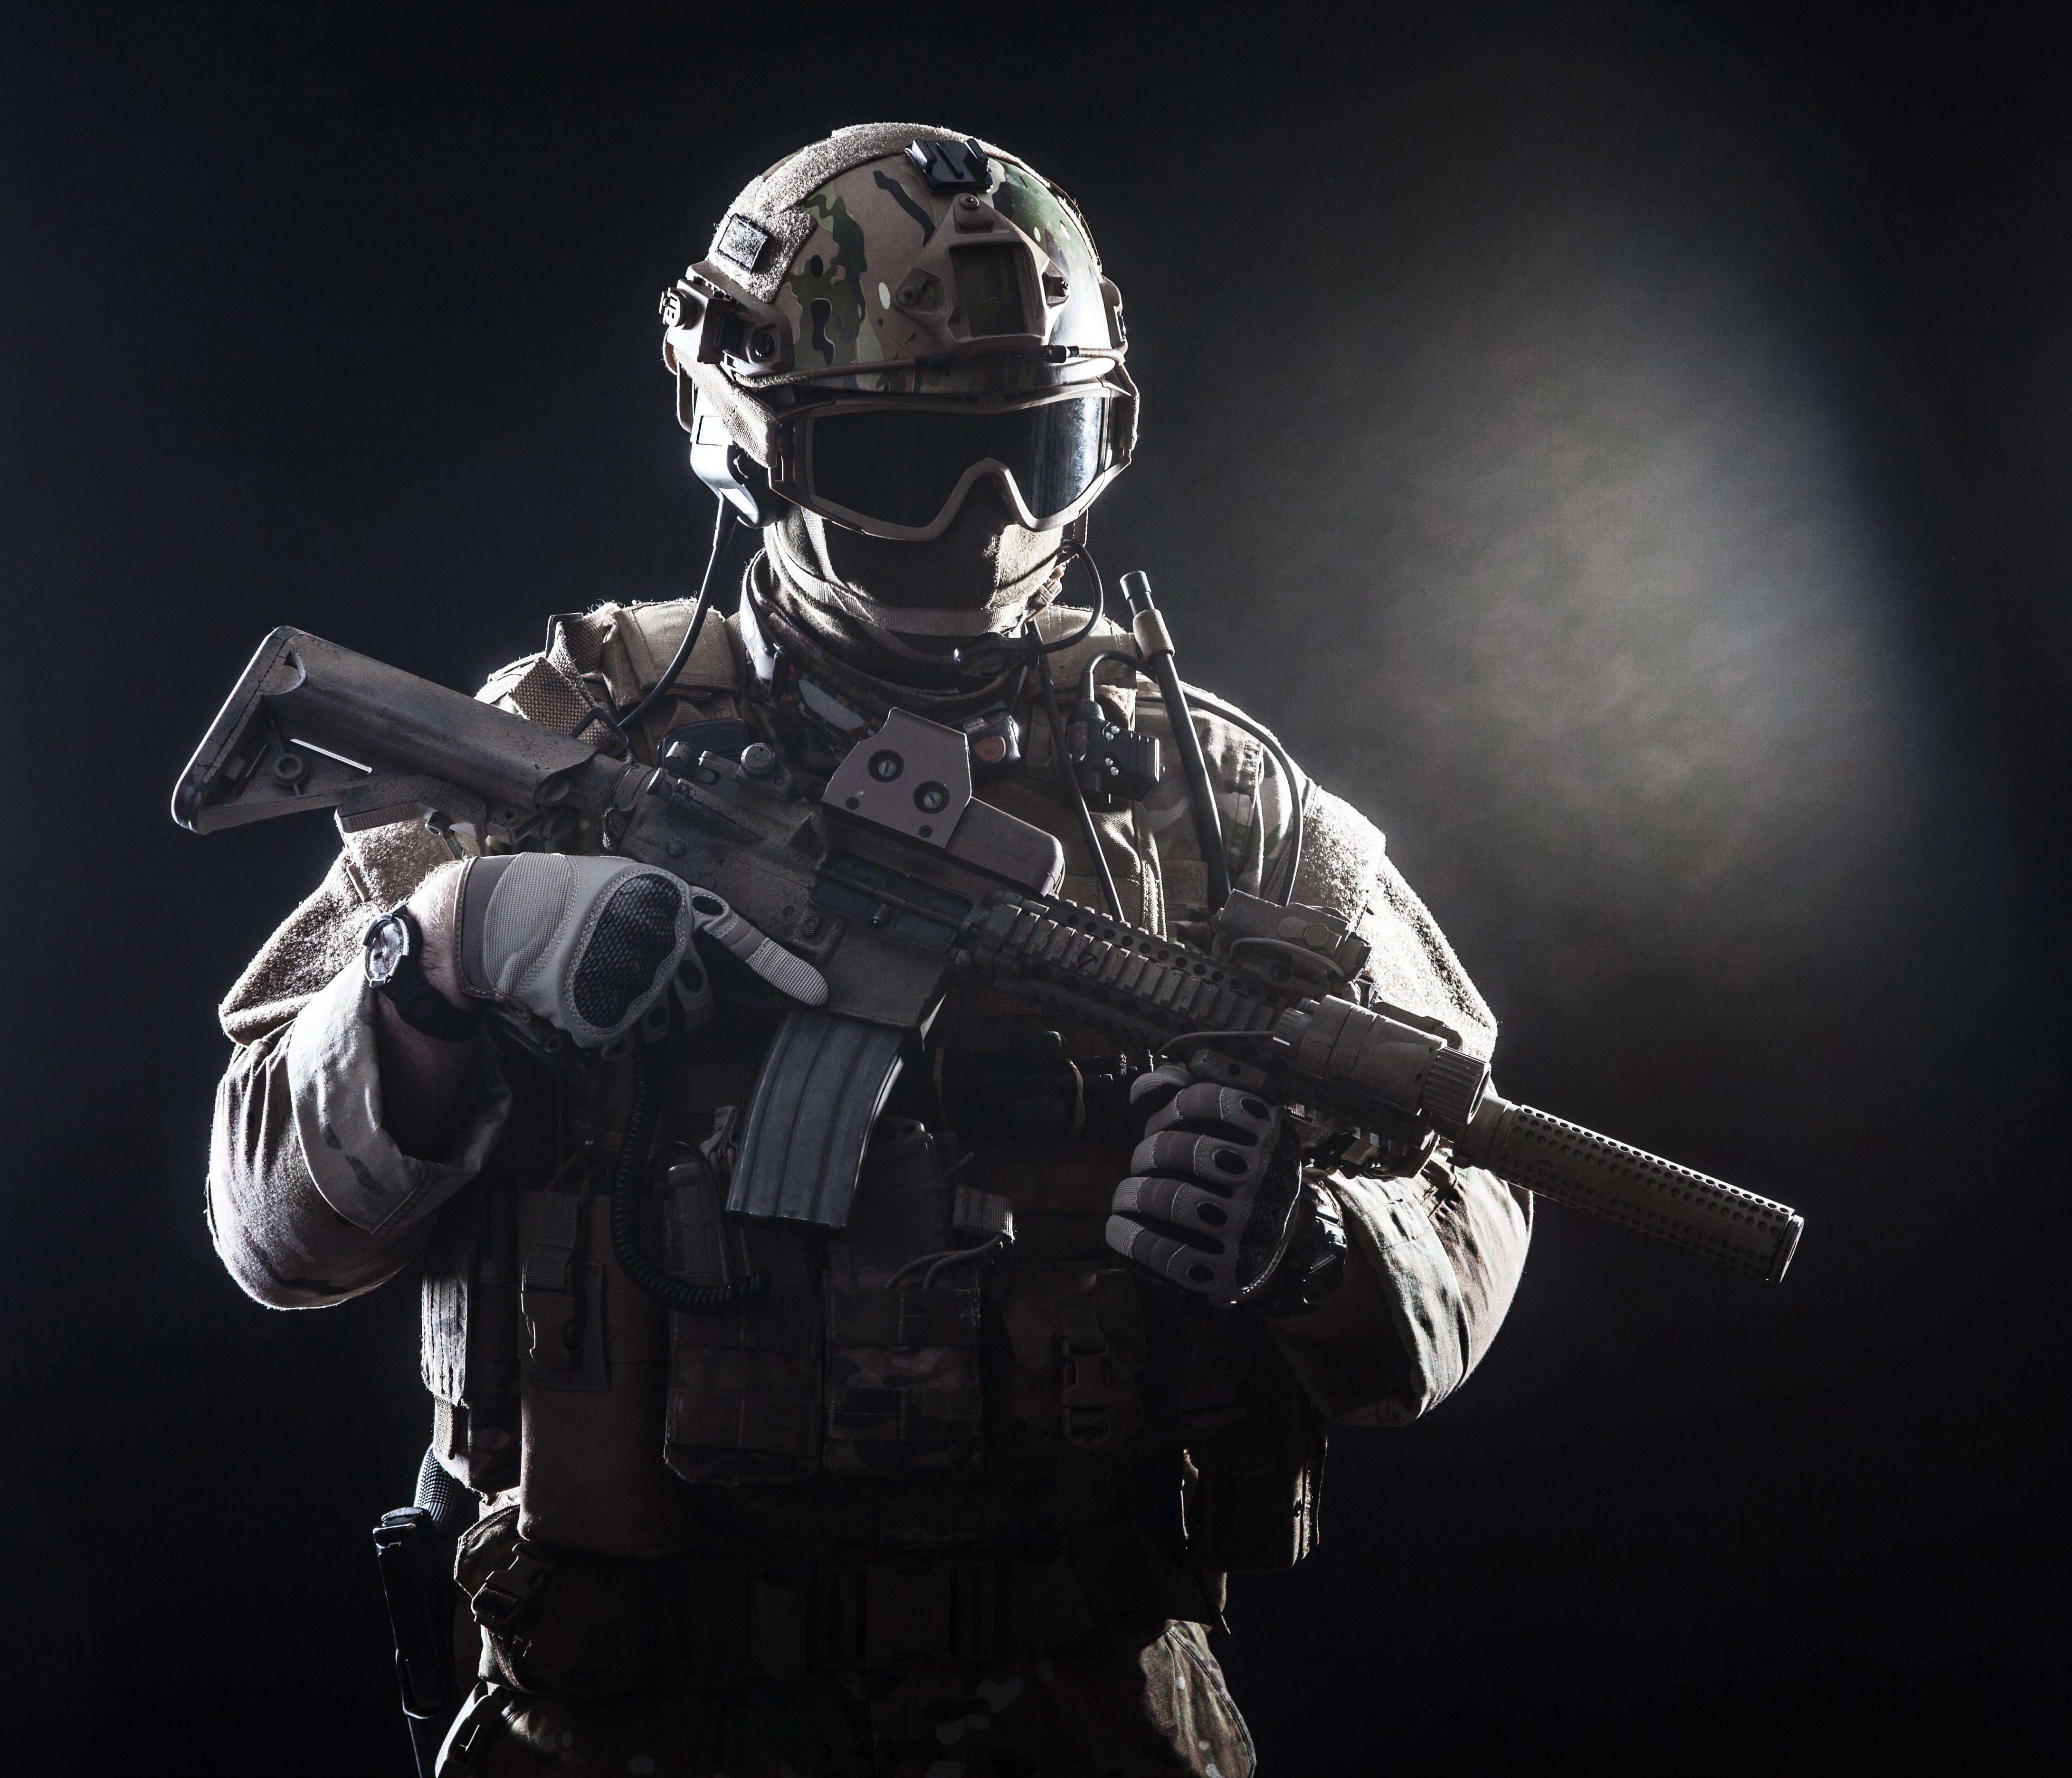 HK 416 soldier